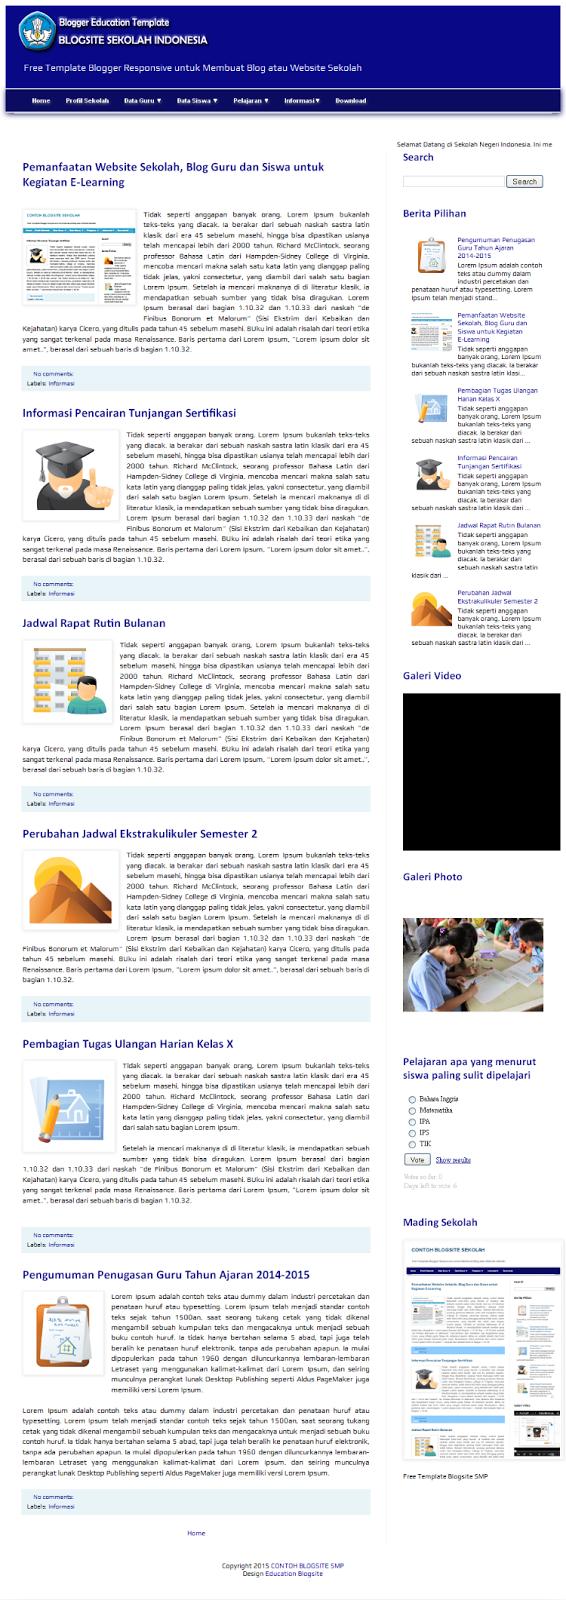 Membuat Website Sekolah Dengan Blogger Dan Template Blog